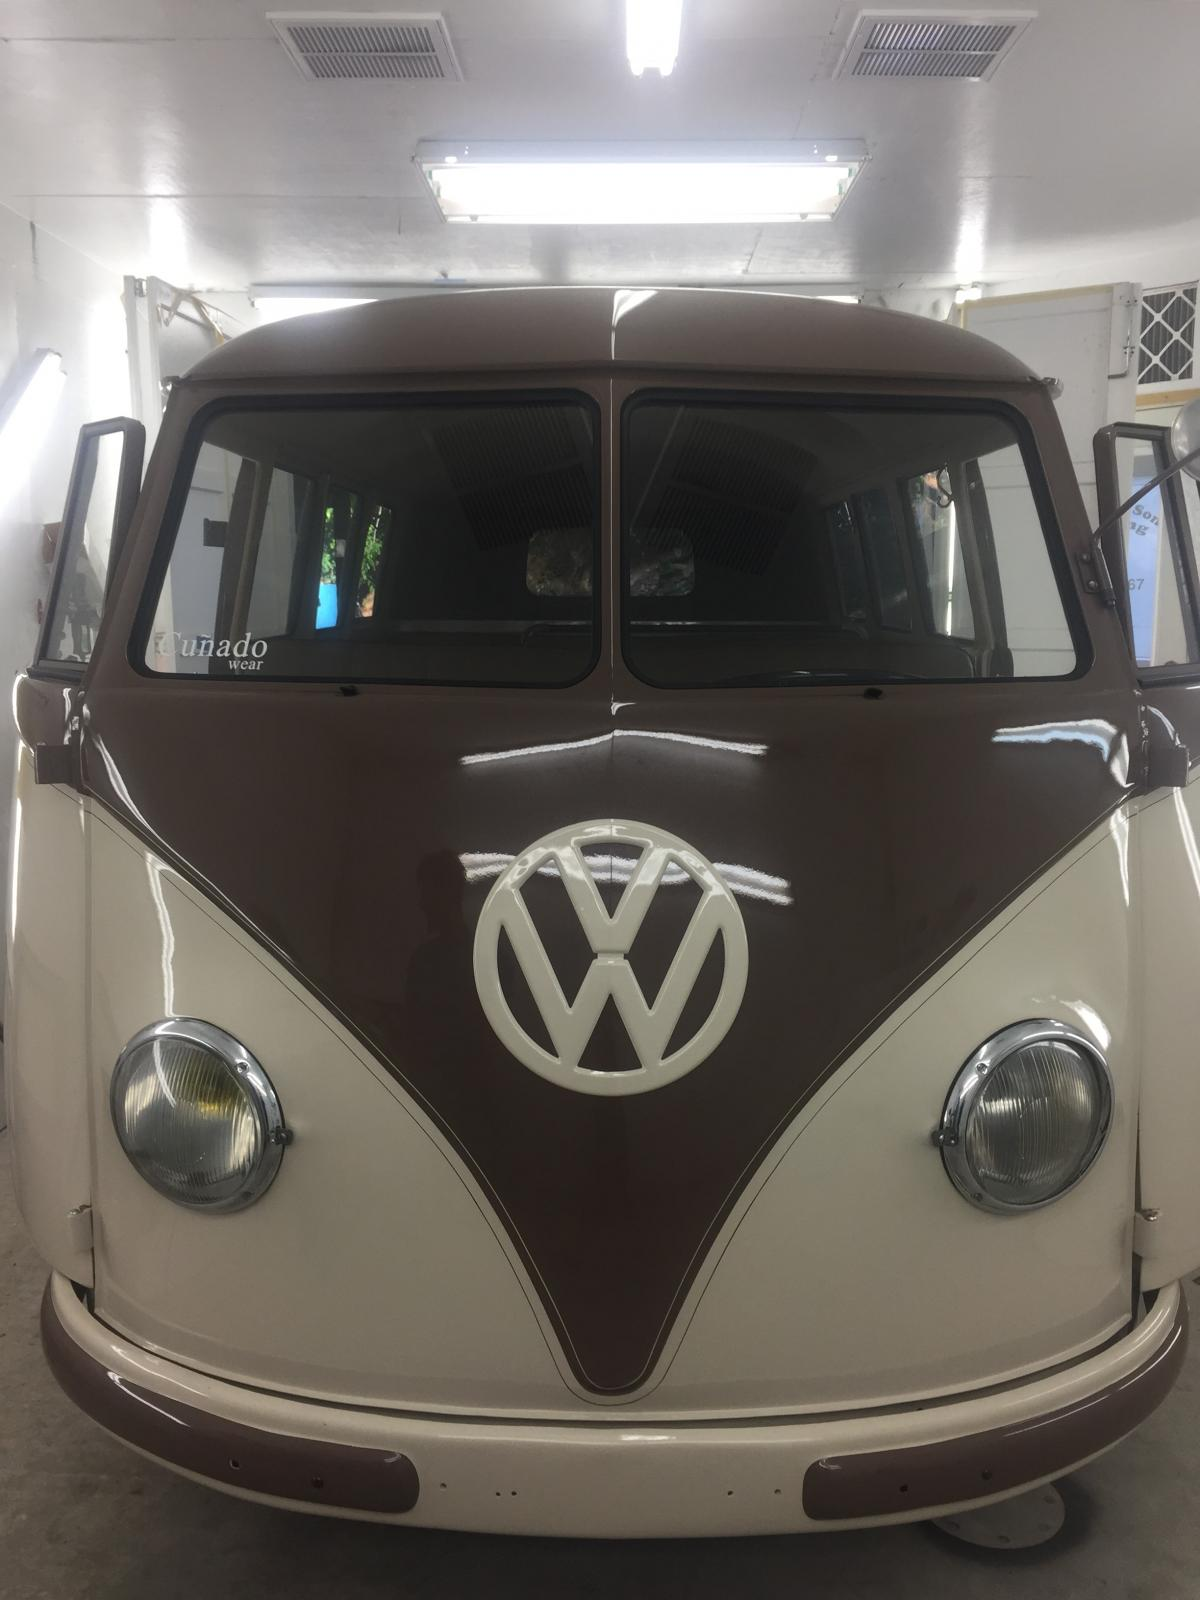 My new bus